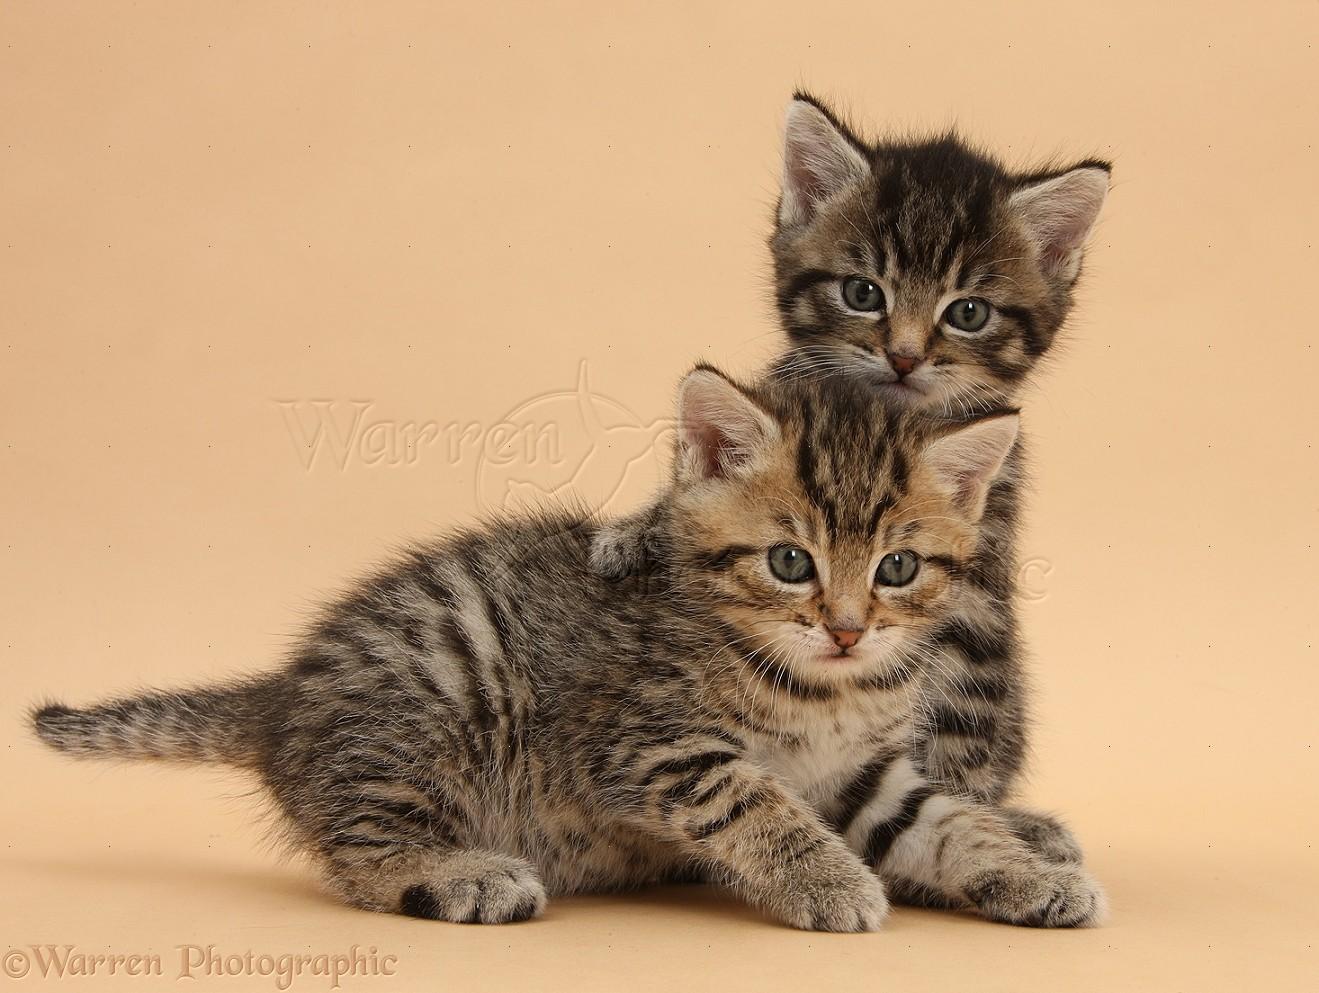 Cute tabby kittens 6 weeks old on beige background photo WP